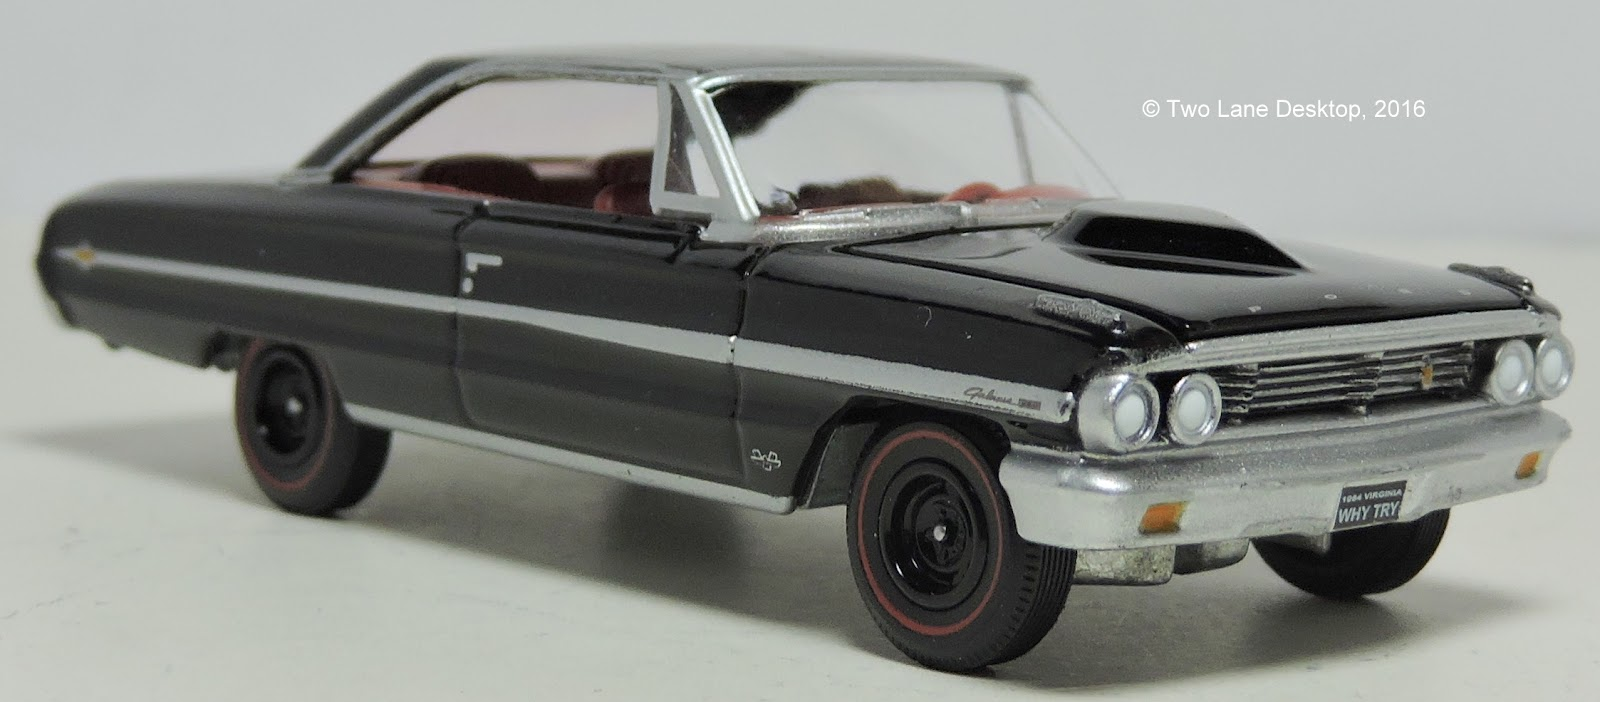 Auto World 1964 Ford Galaxie 500XL Thunderbolt | Two Lane